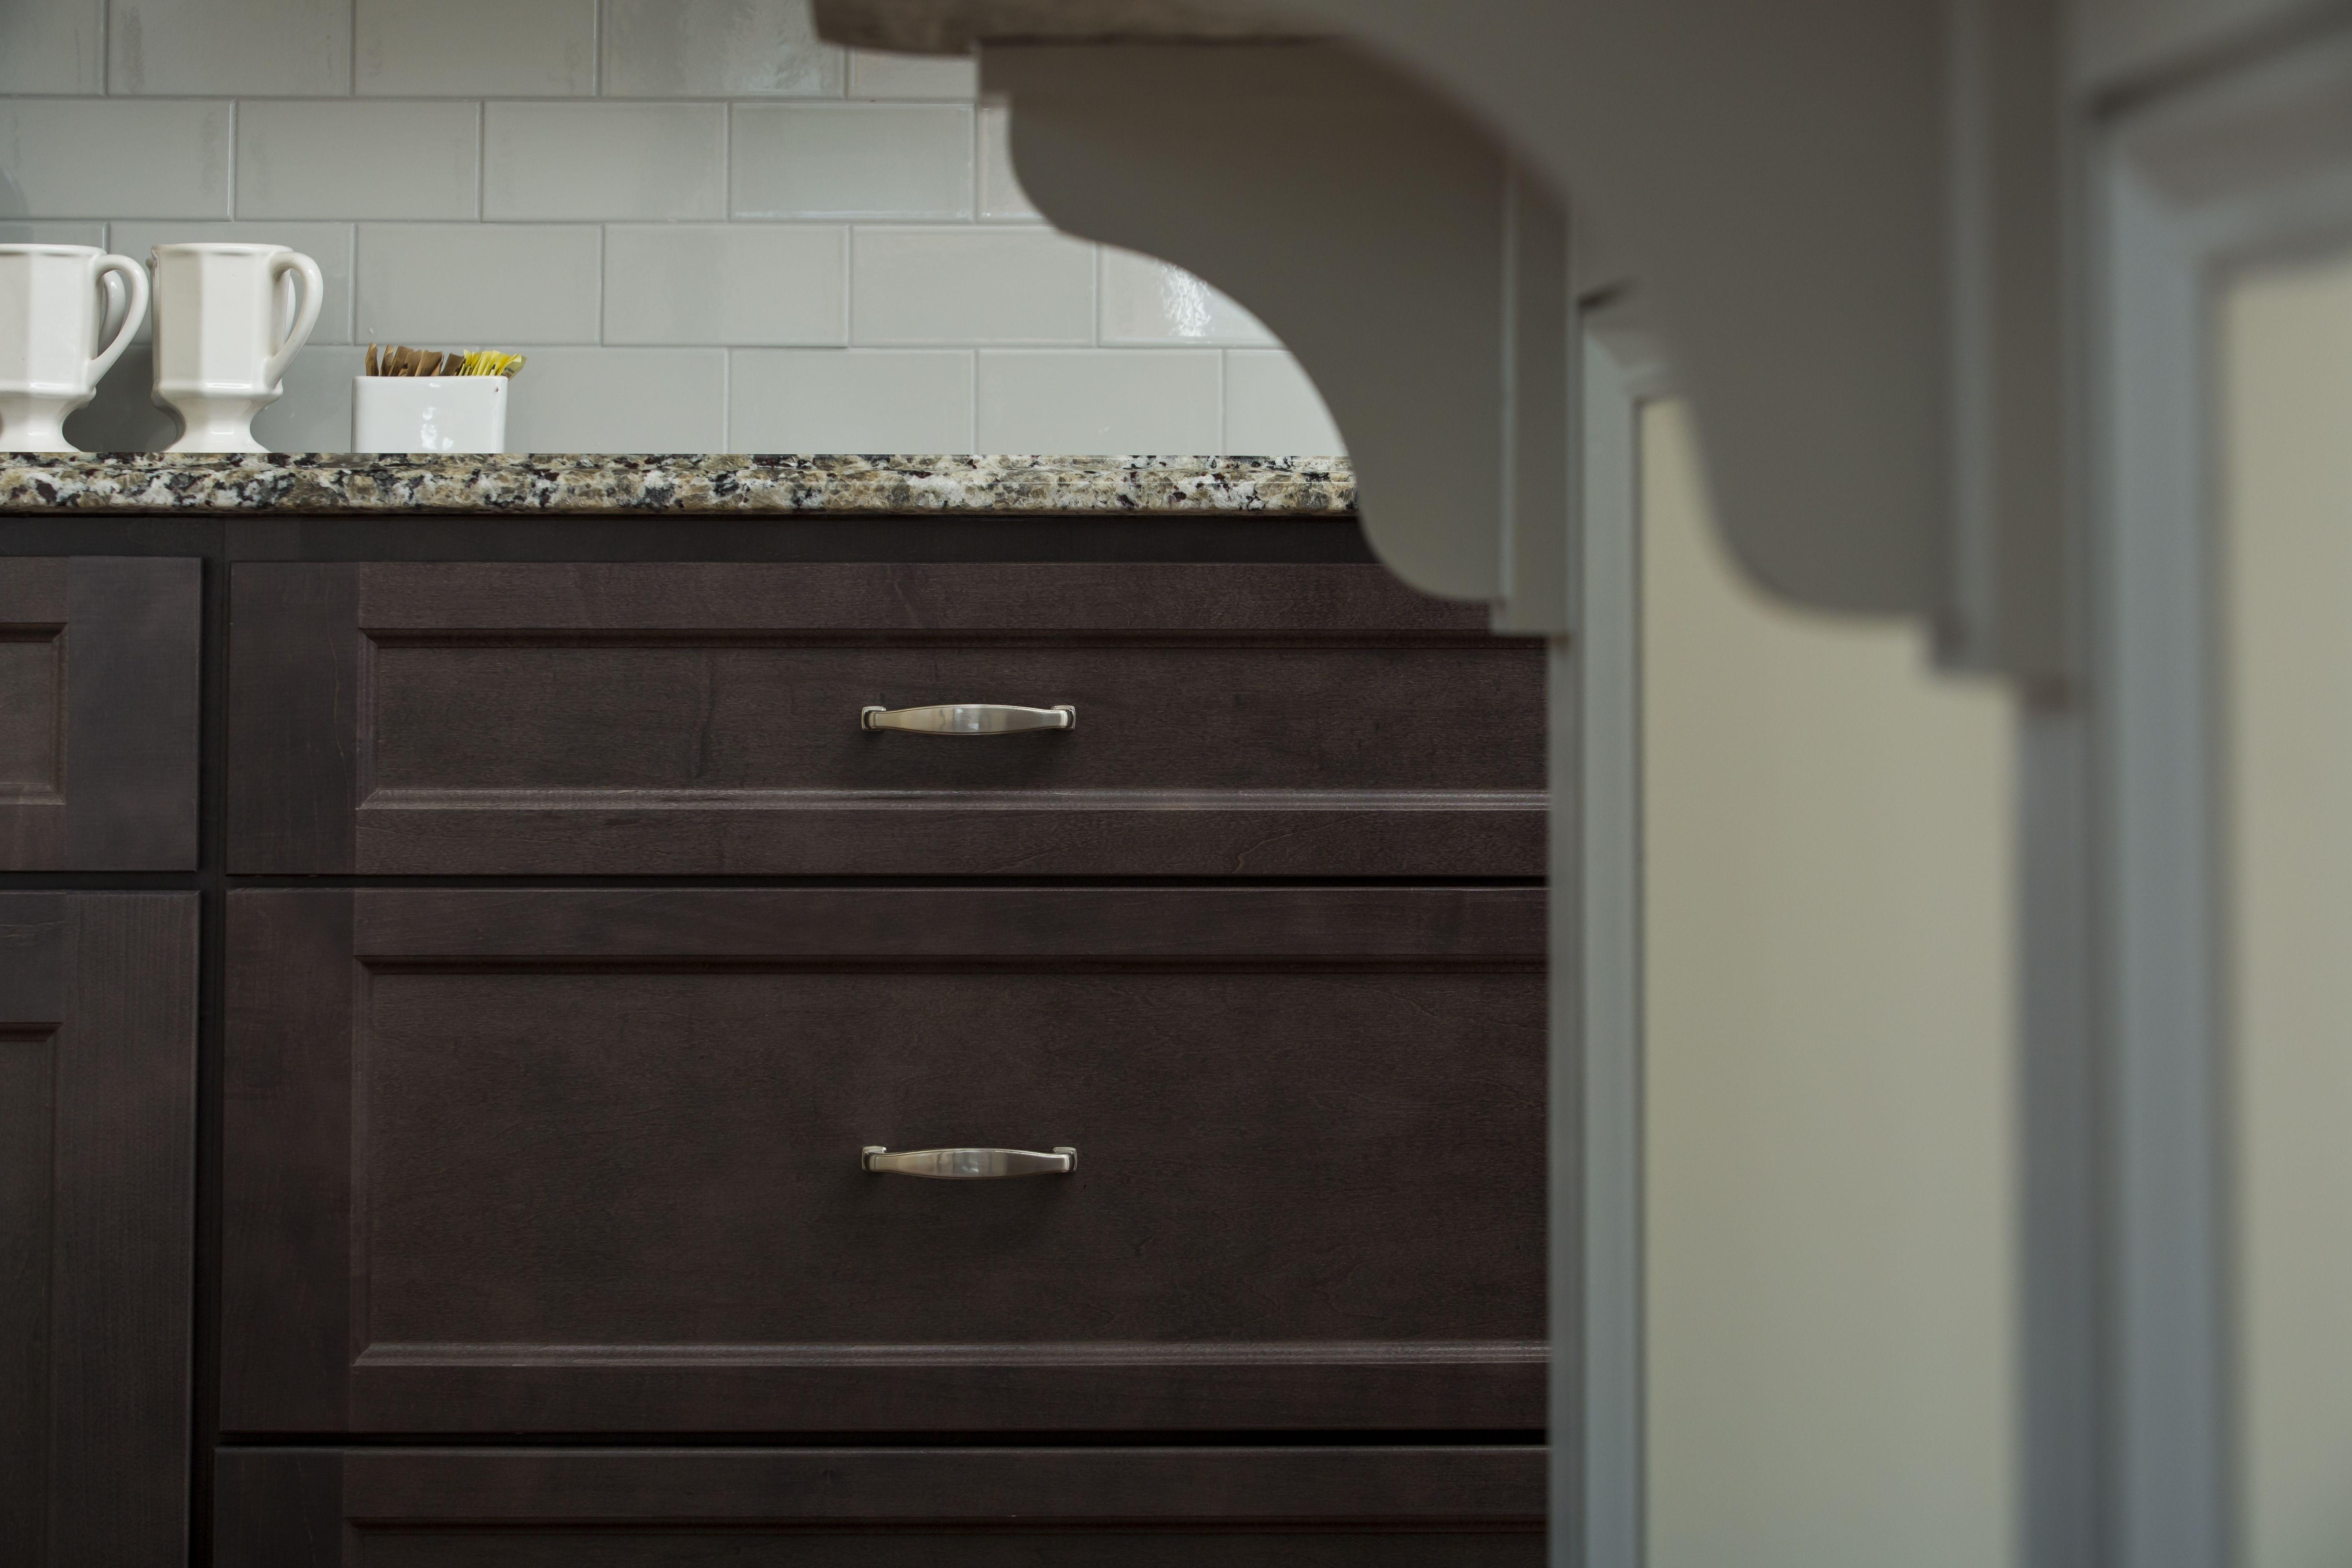 View Of The Wolf Classic Line Of Cabinets Using The York Door Style In A Dark Grey Sta Kitchen Decor Modern Elegant Kitchen Design Kitchen Cabinets In Bathroom